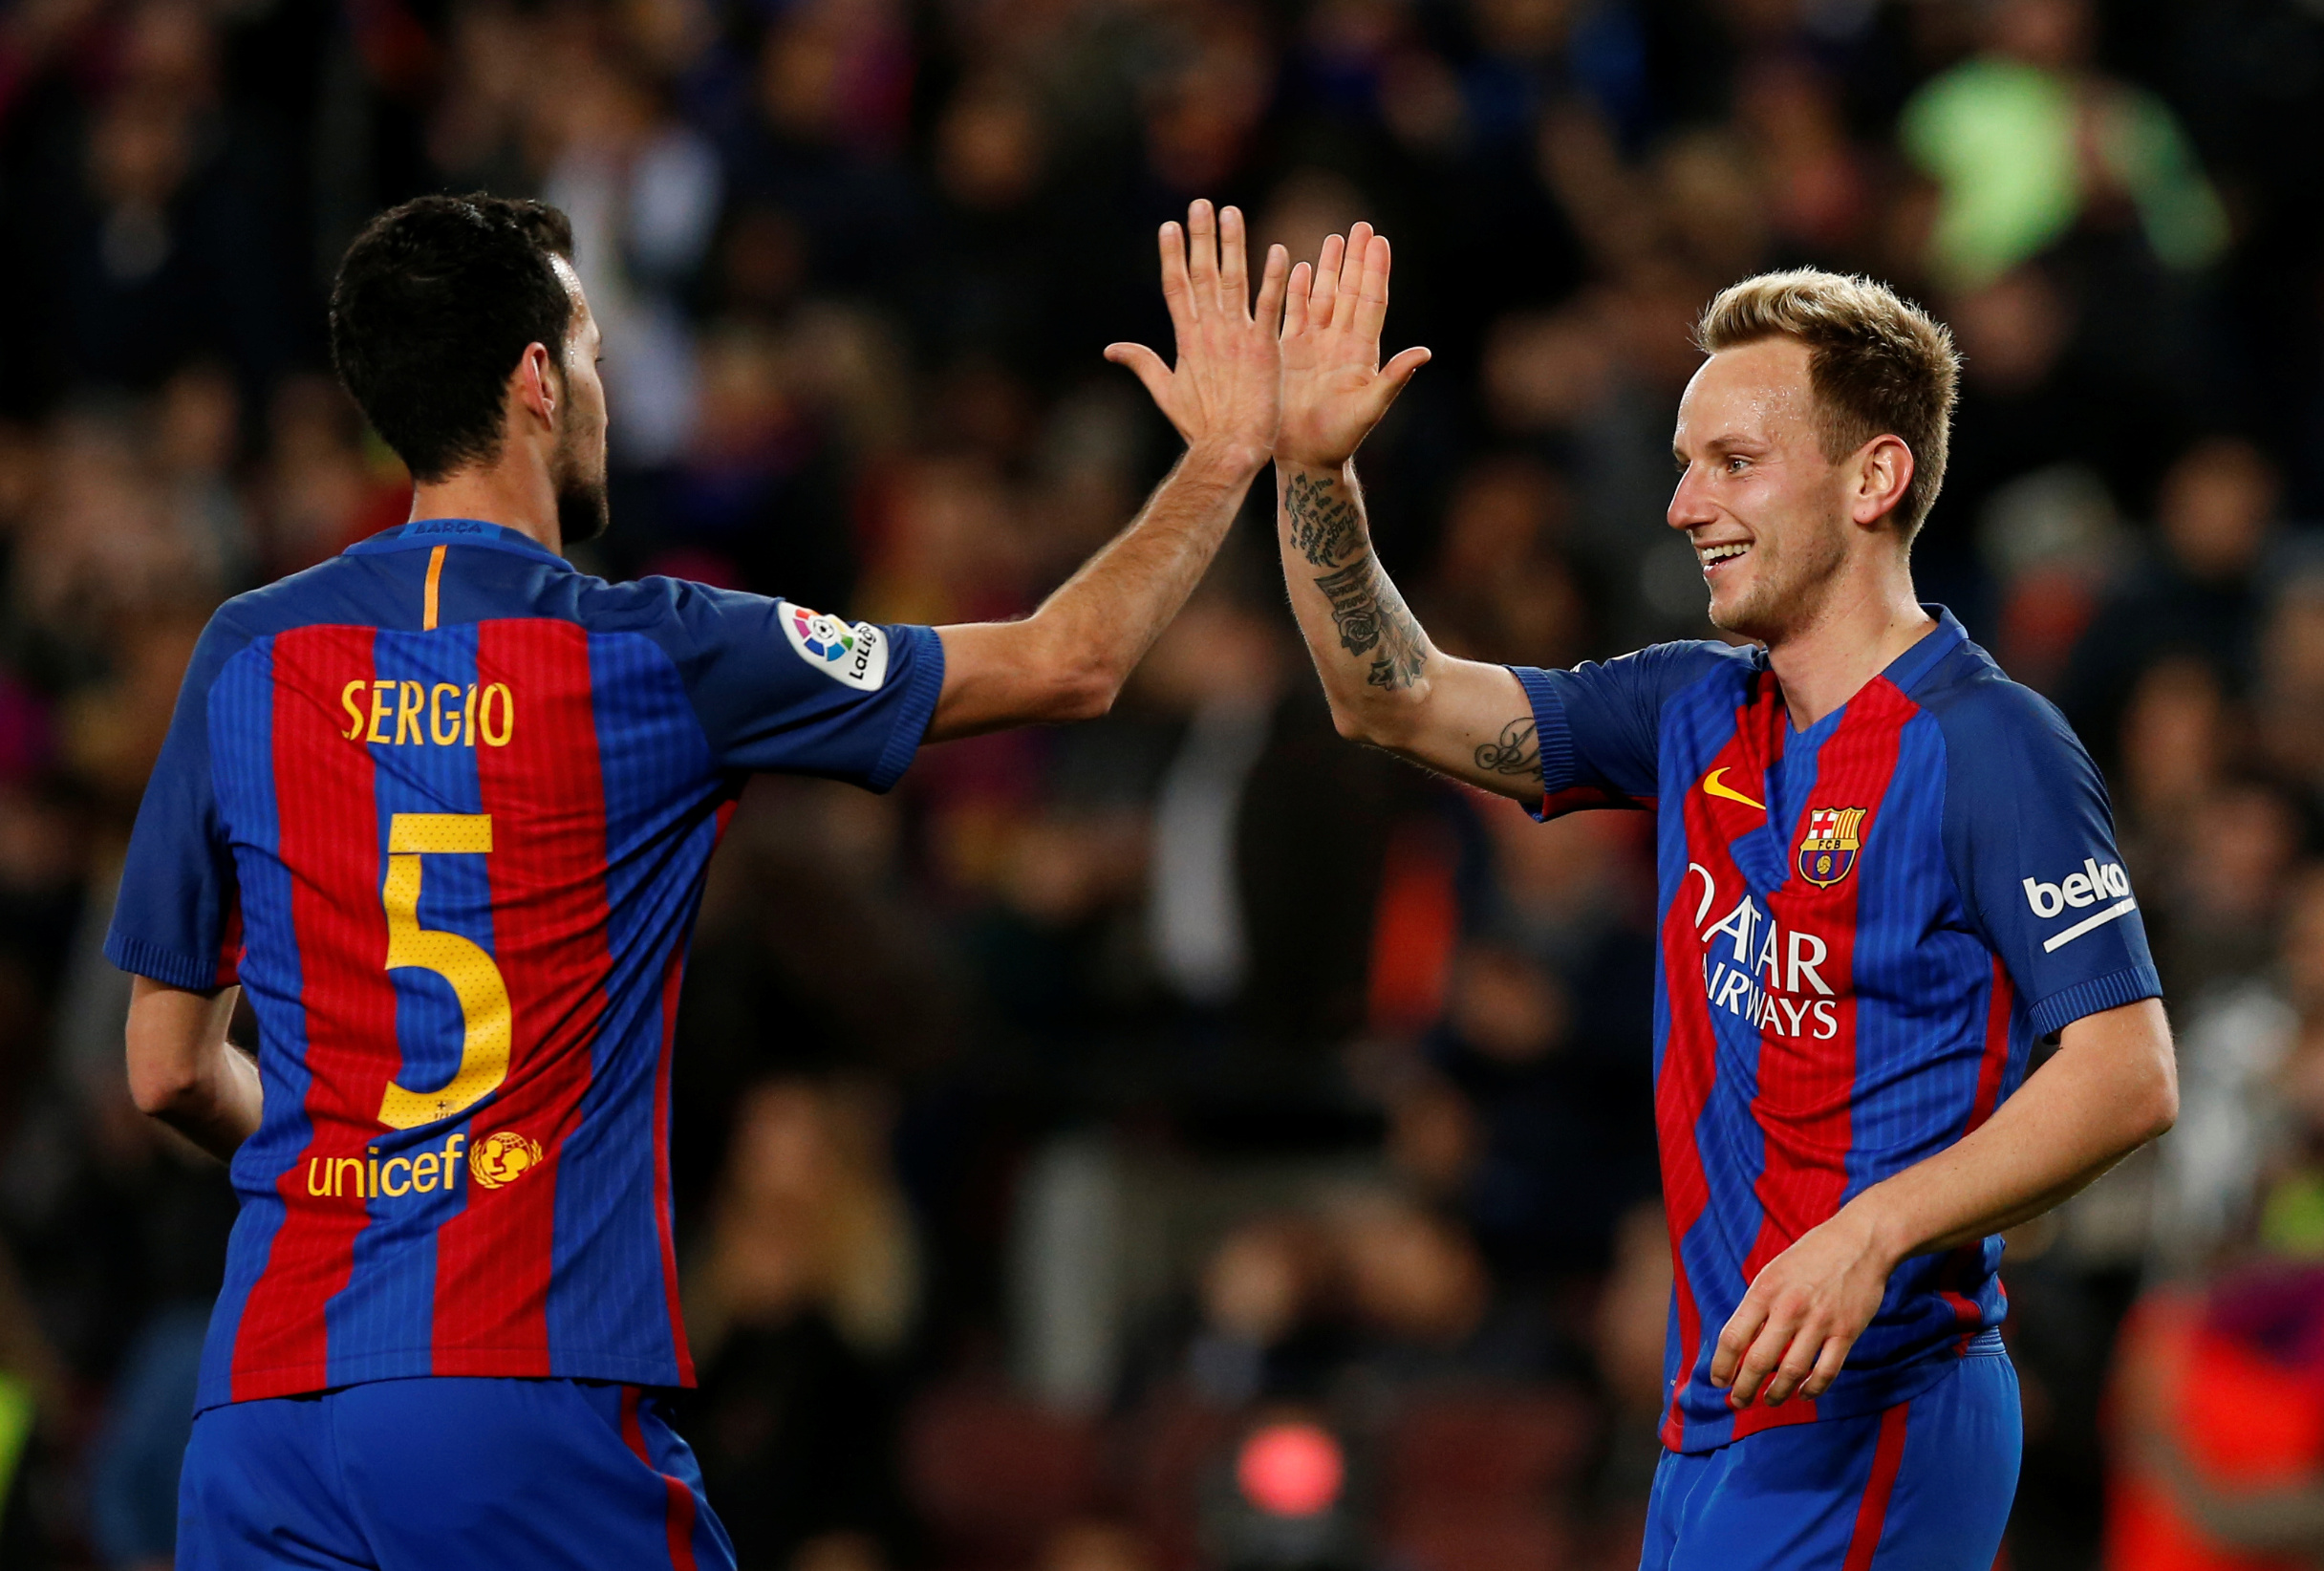 Football Soccer - Barcelona v Celta Vigo - Spanish La Liga Santander - Camp Nou stadium, Barcelona, Spain - 4/03/2017. Barcelona's Ivan Rakitic and Sergio Busquets celebrate a goal. REUTERS/Albert Gea - RC1D213FFD70